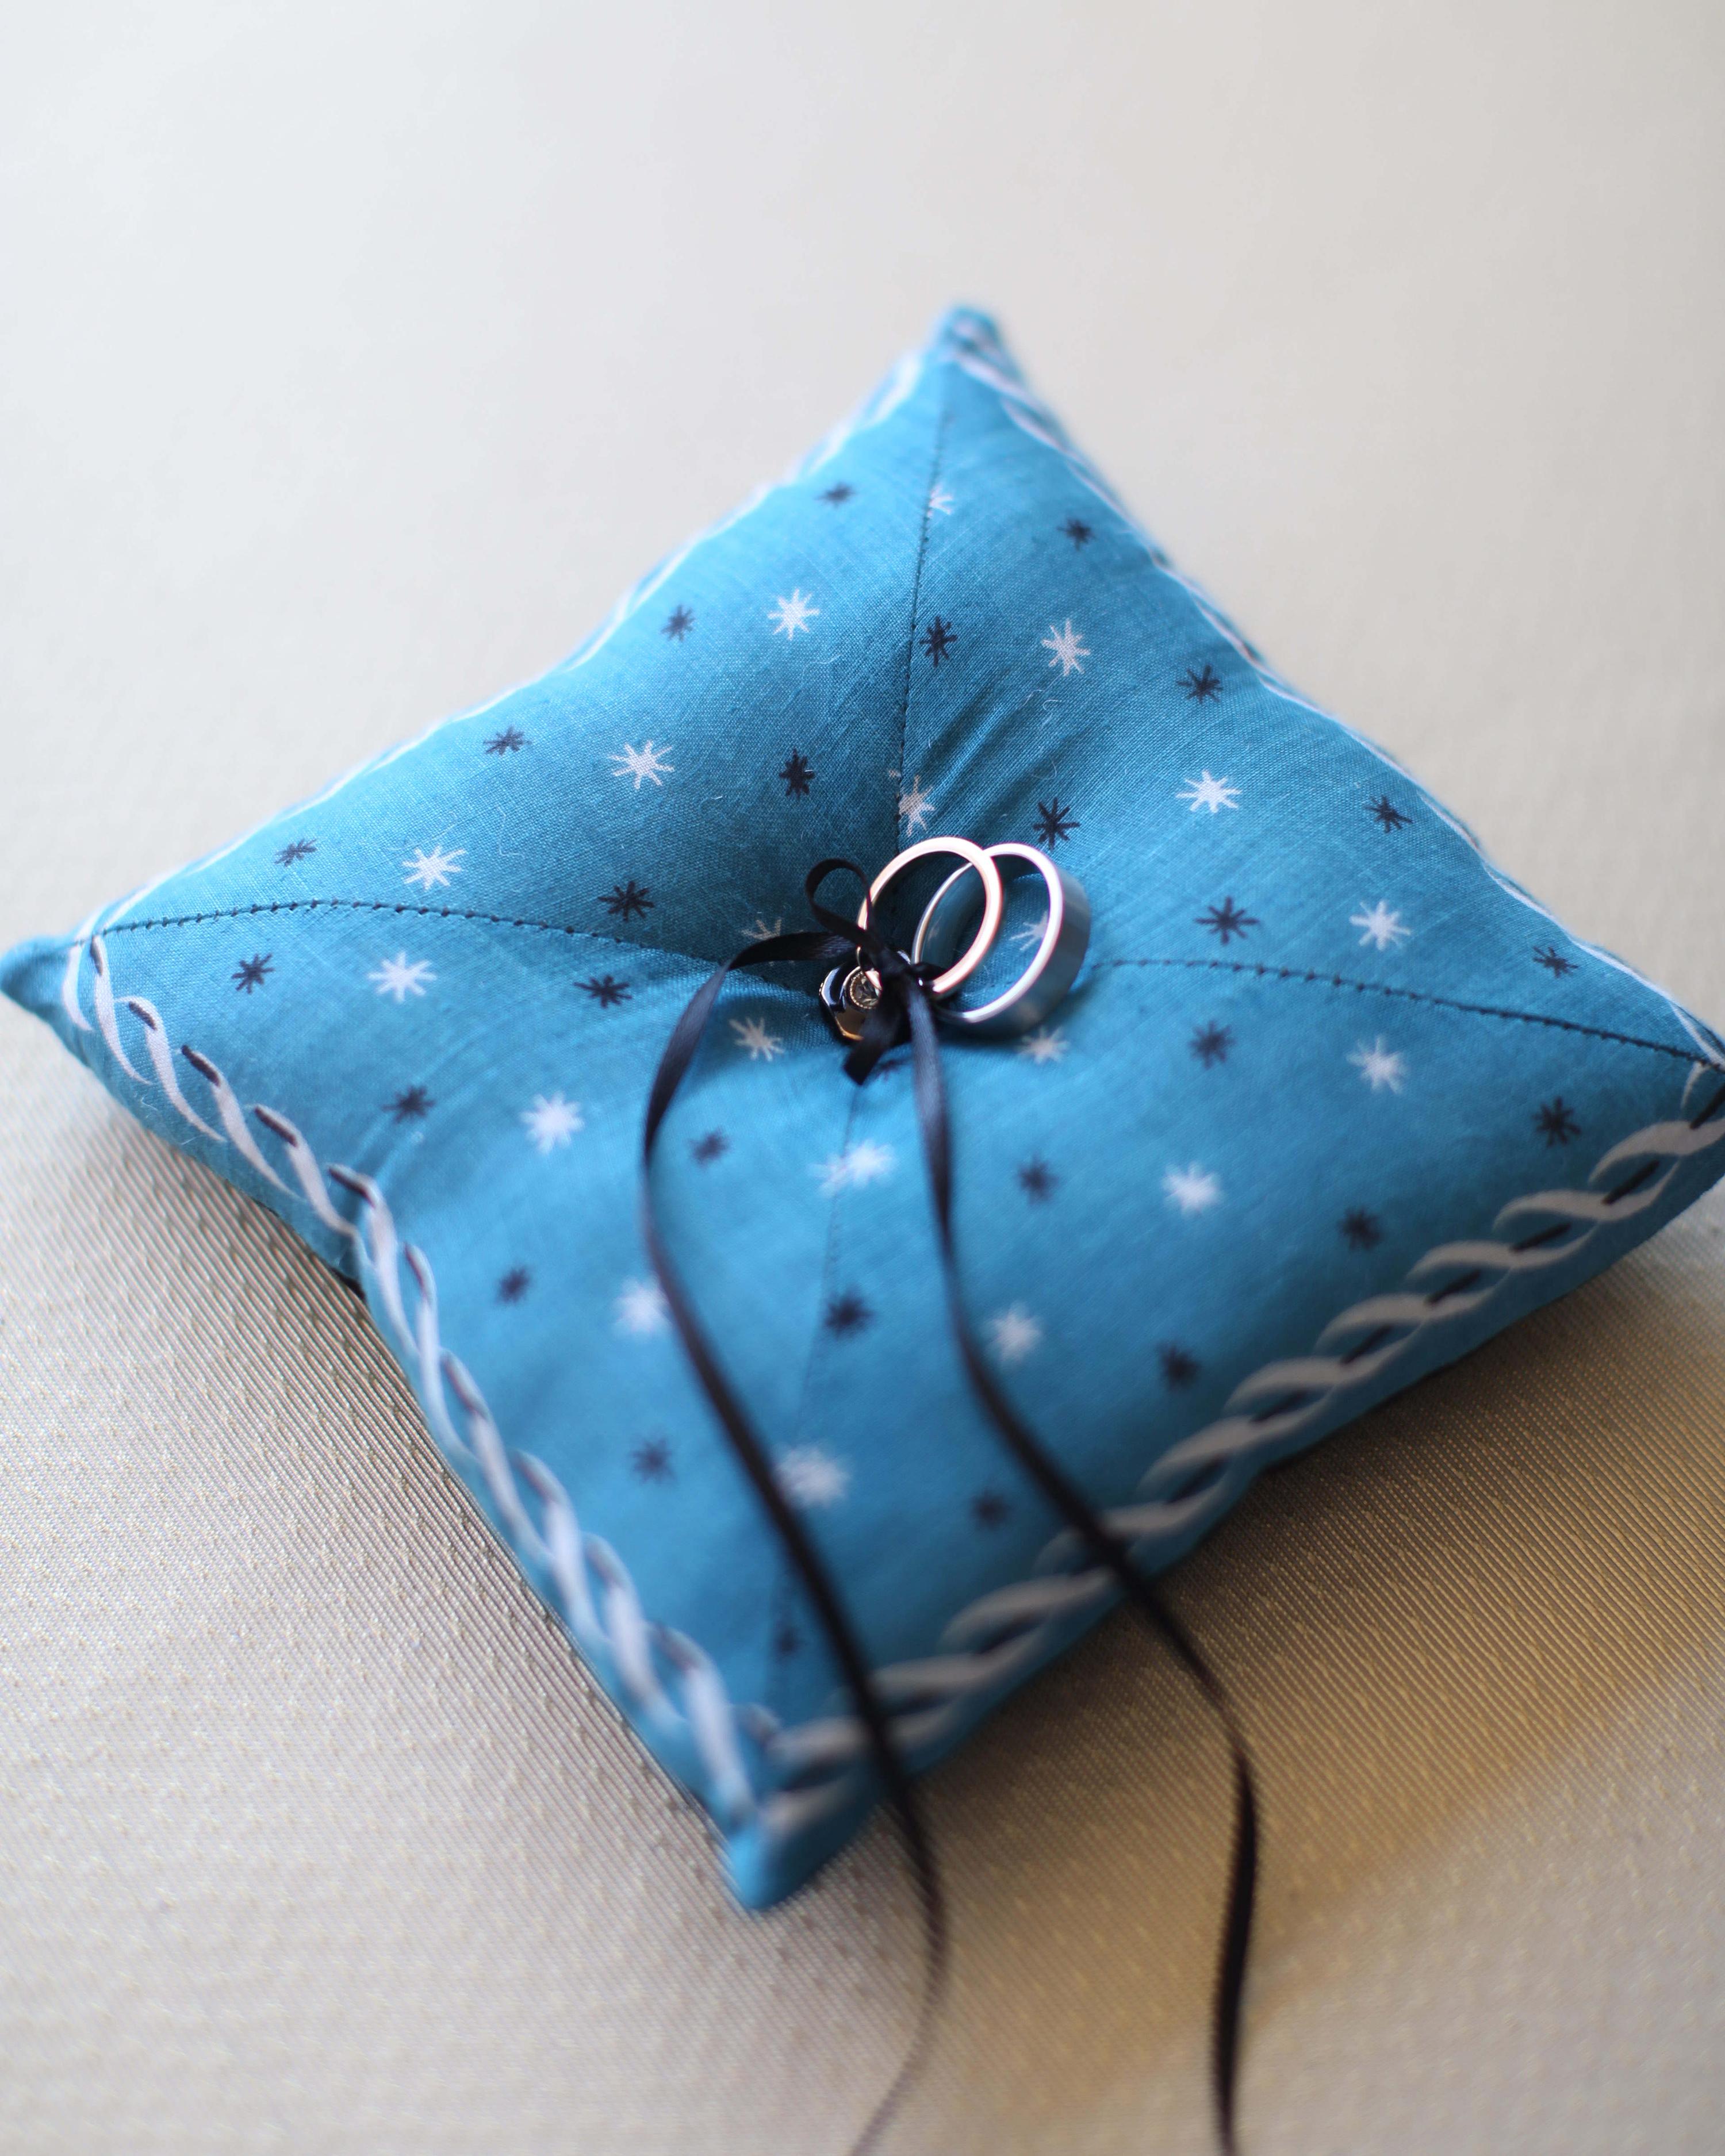 ring-pillow-002-wd109359.jpg